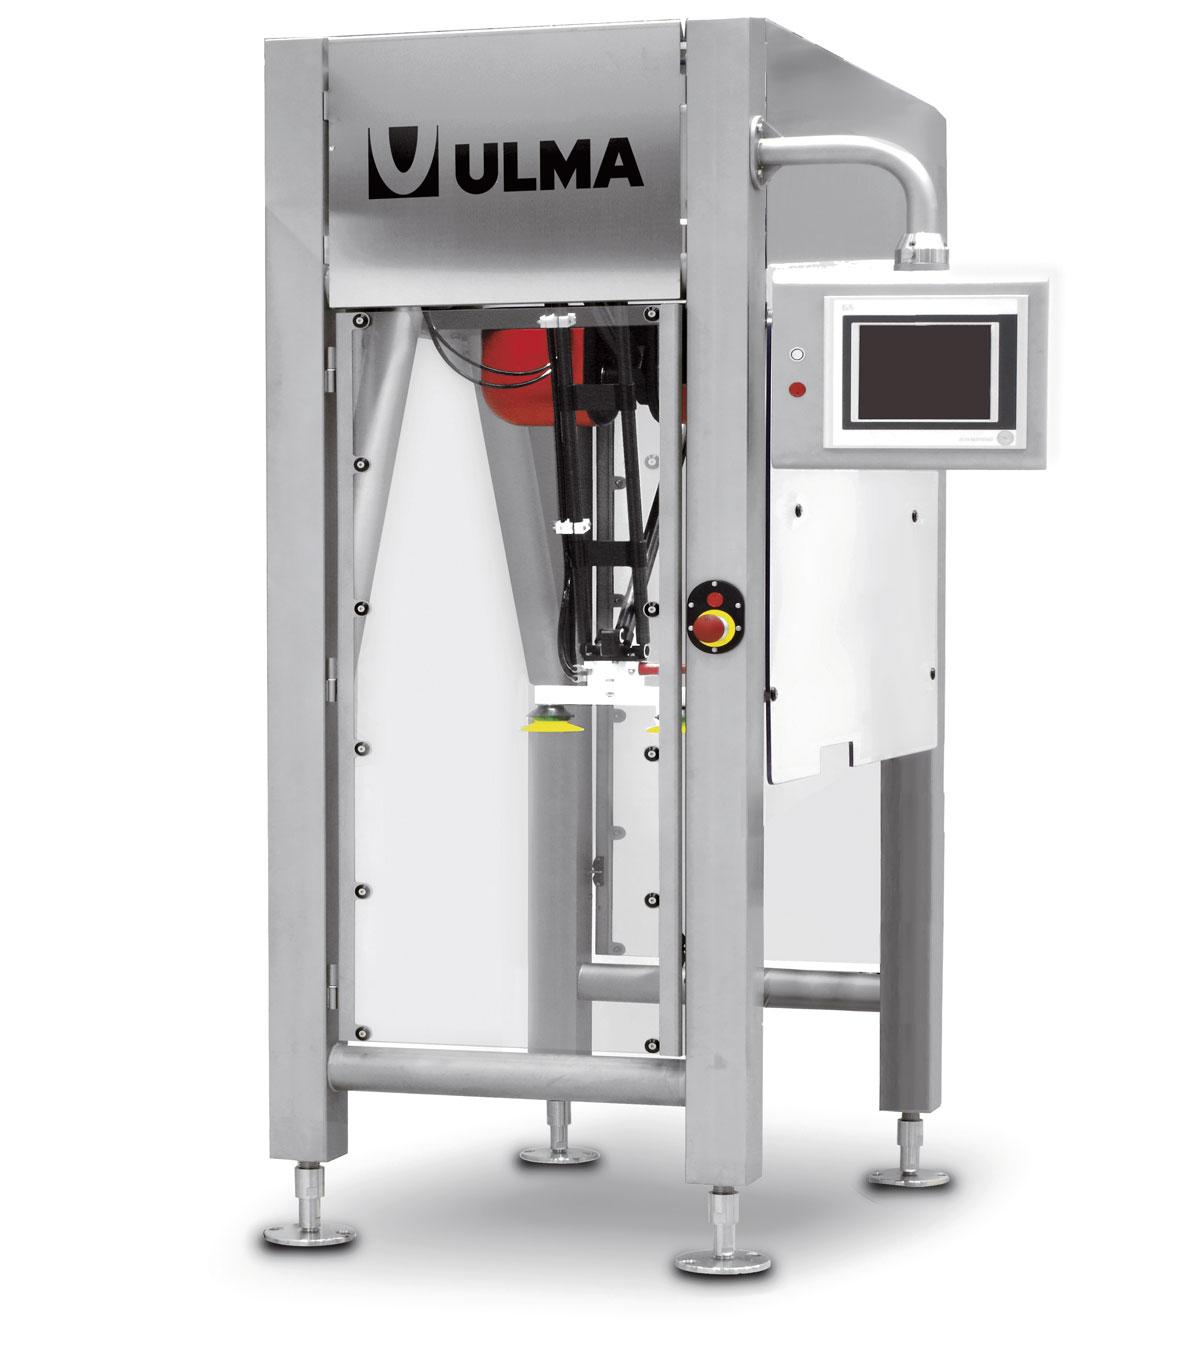 Robot Ulma U10H